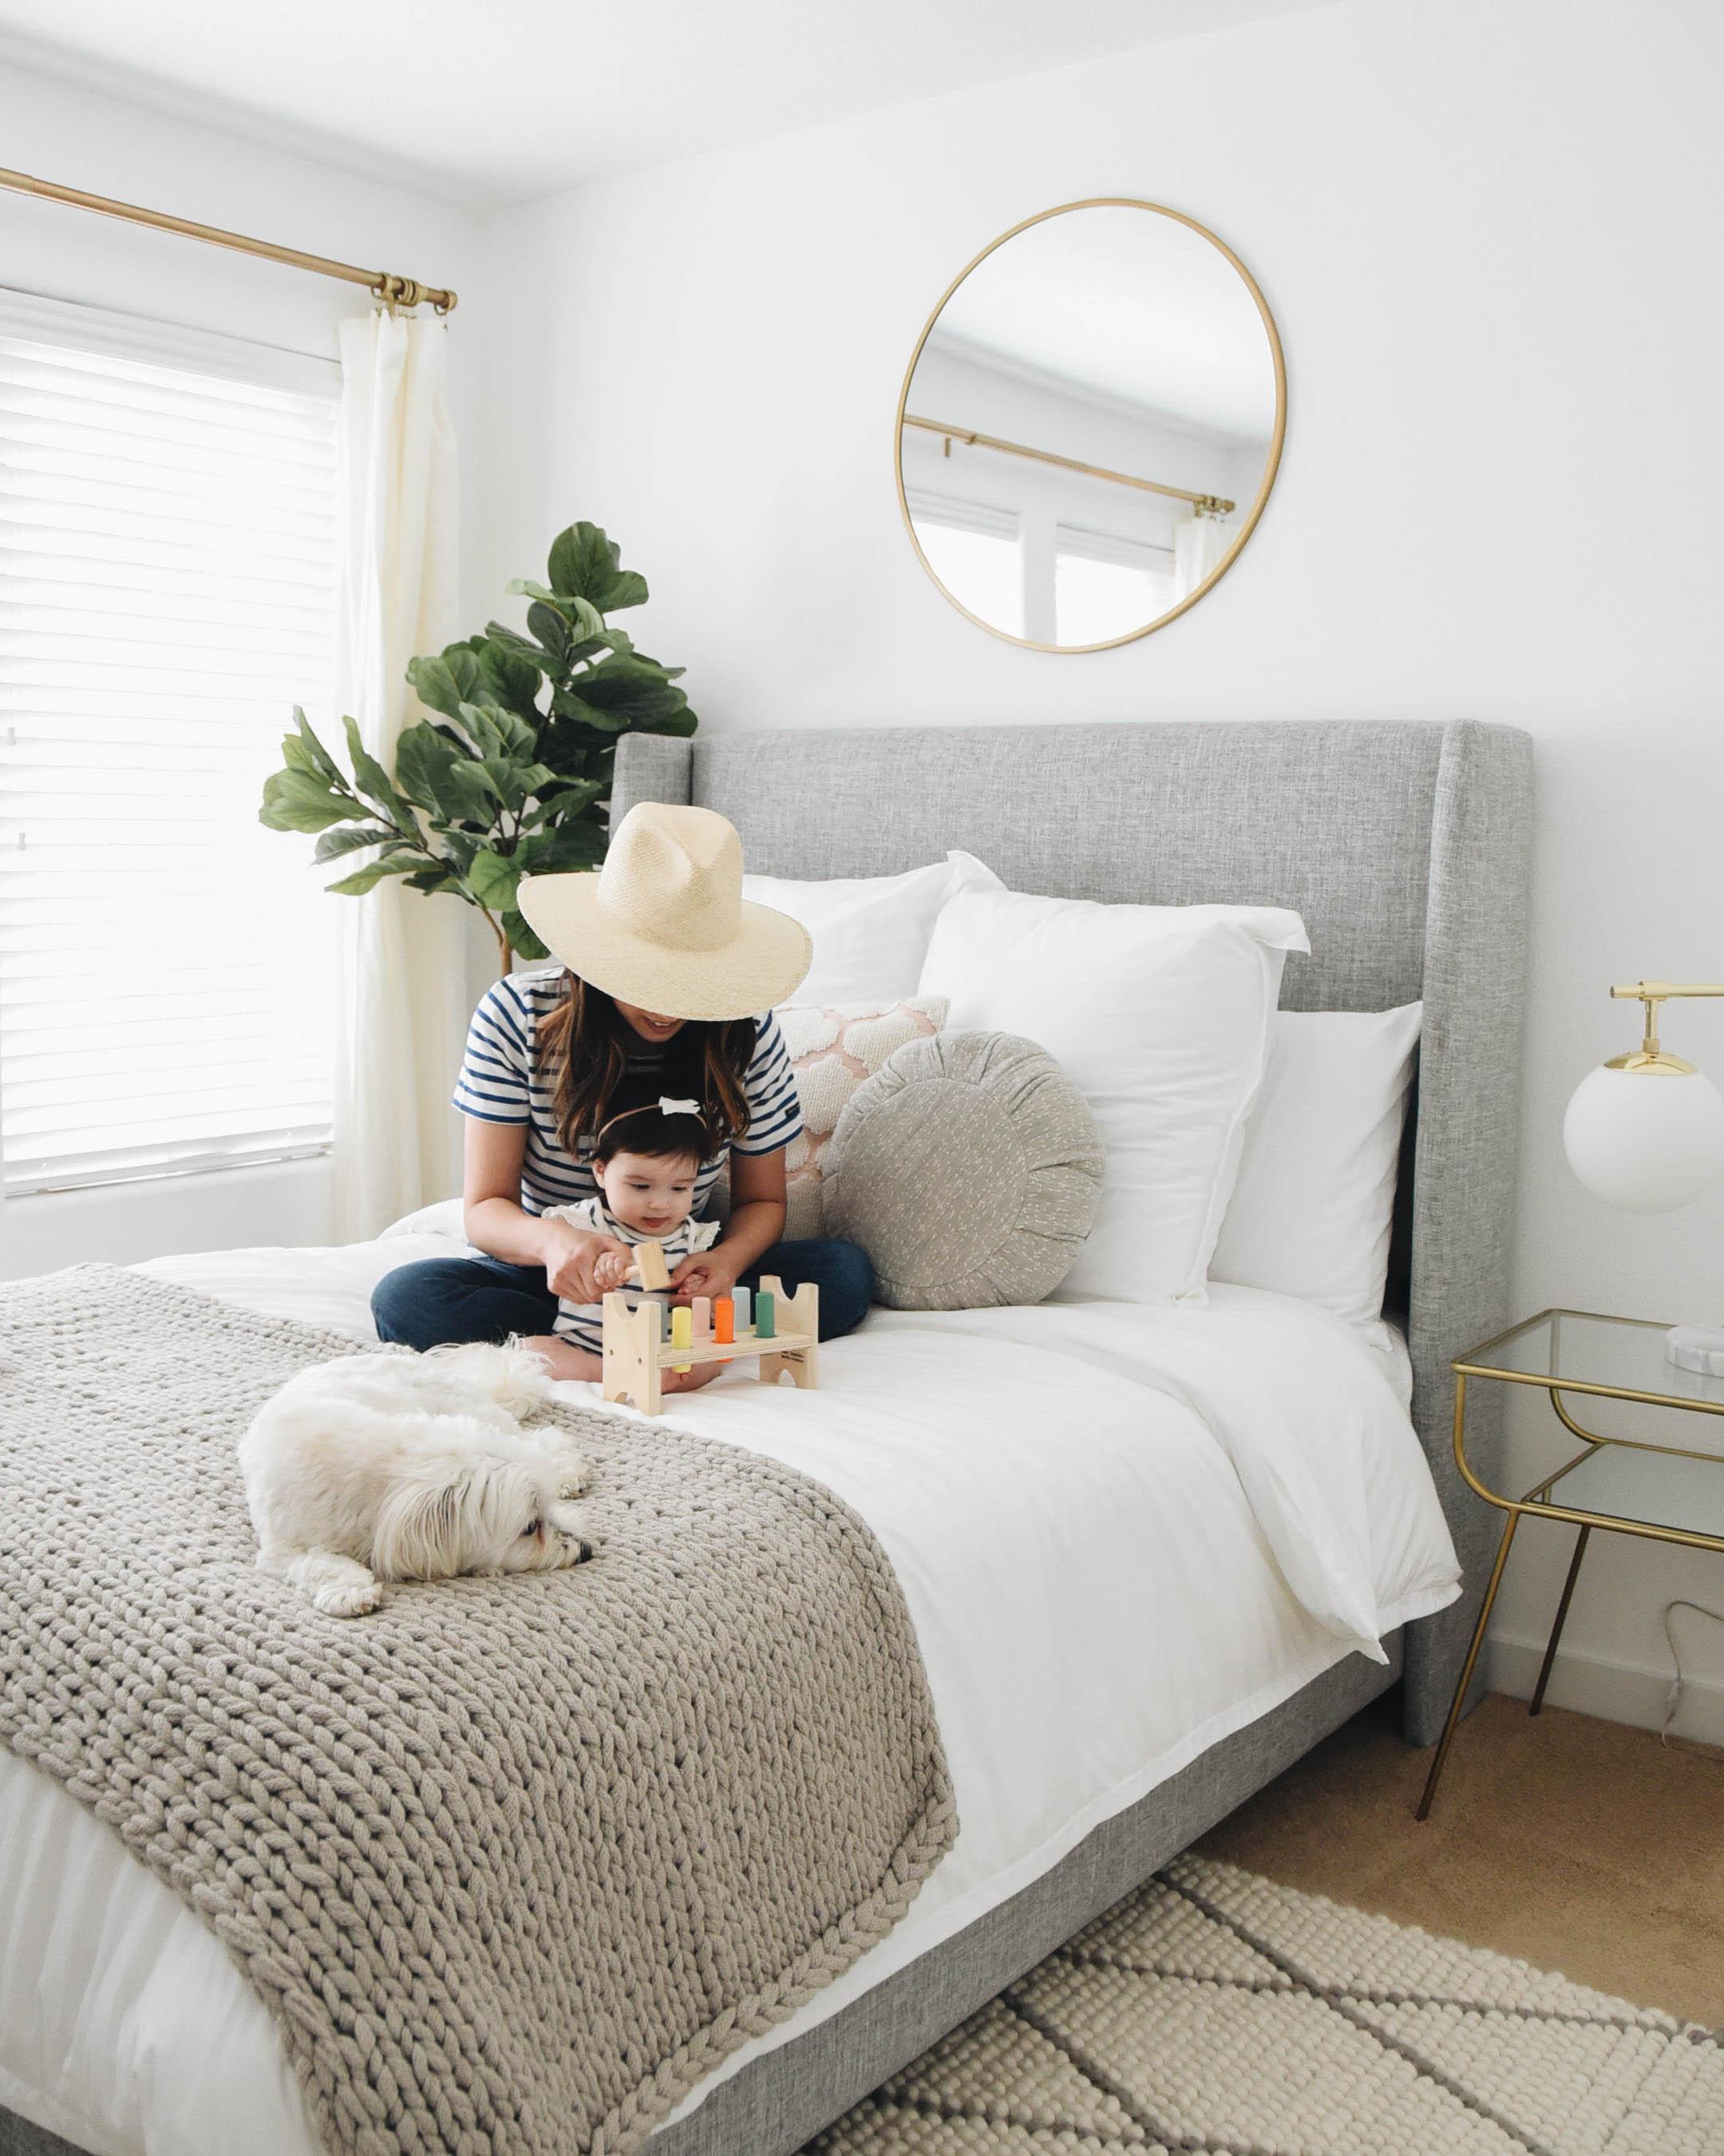 Crystalin Marie Guest Bedroom